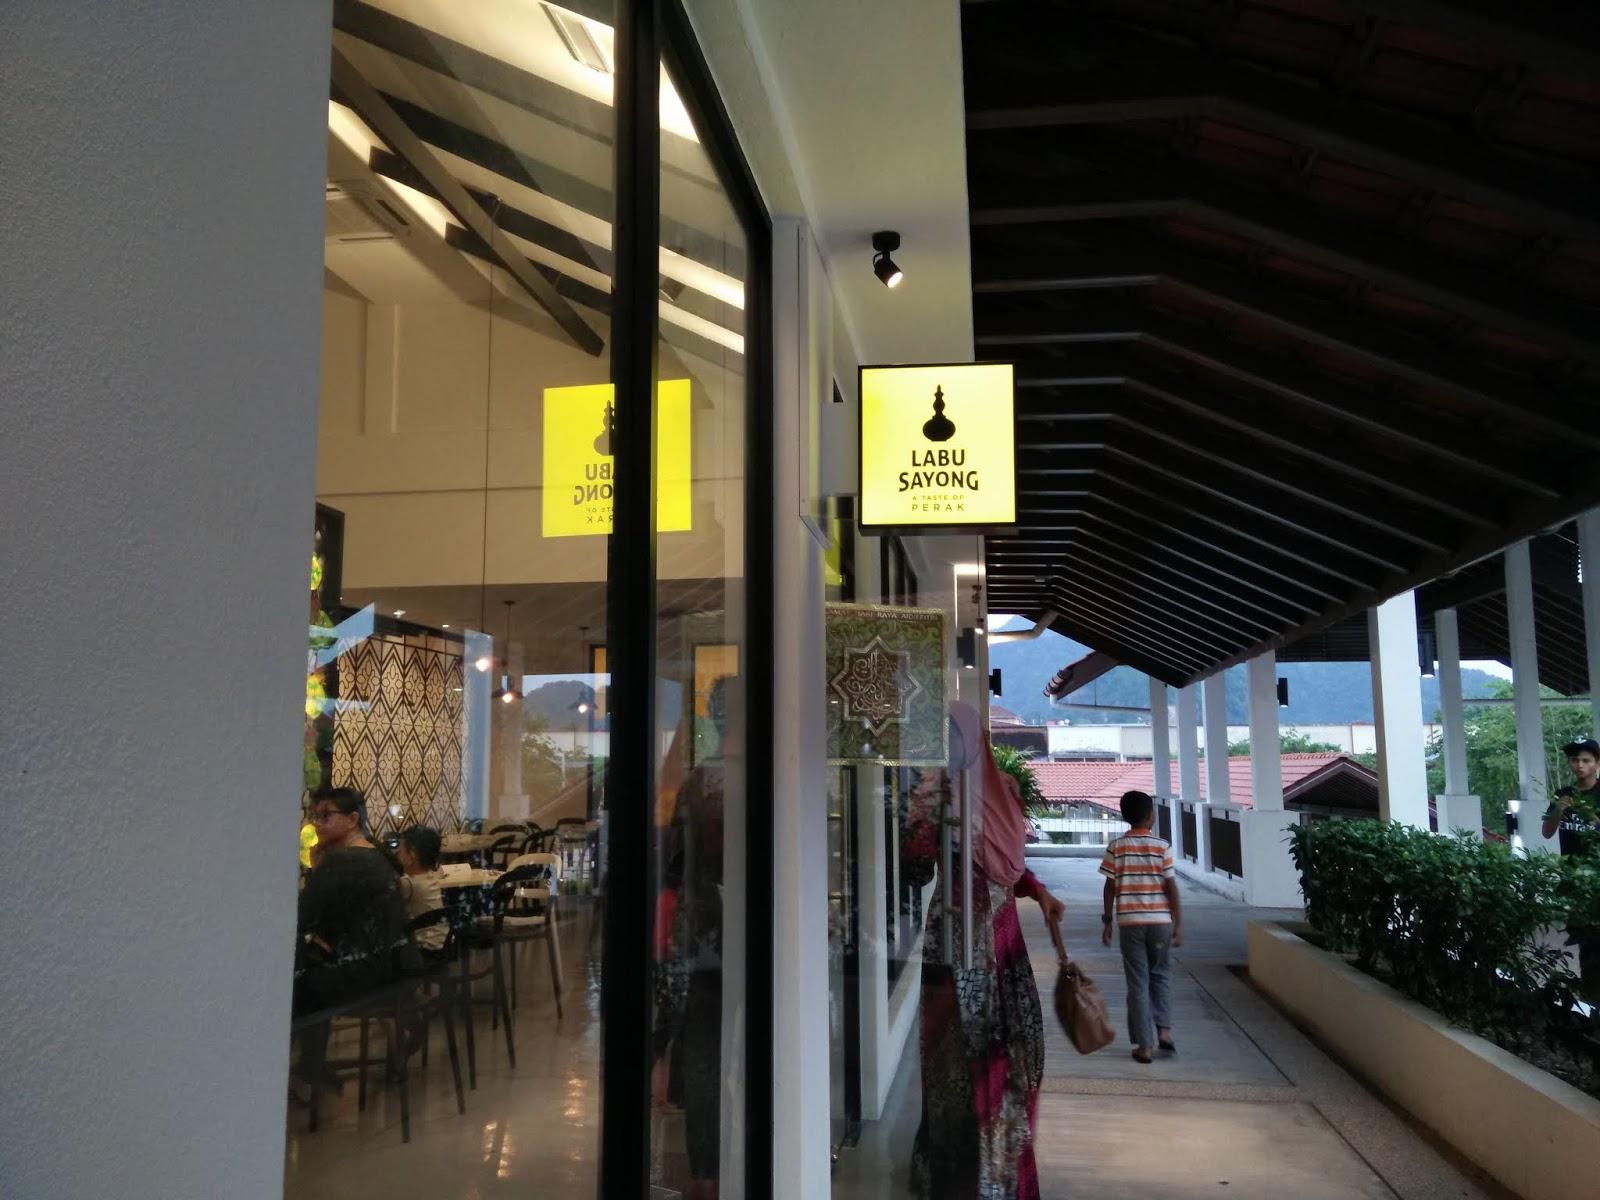 Labu Sayong Cafe